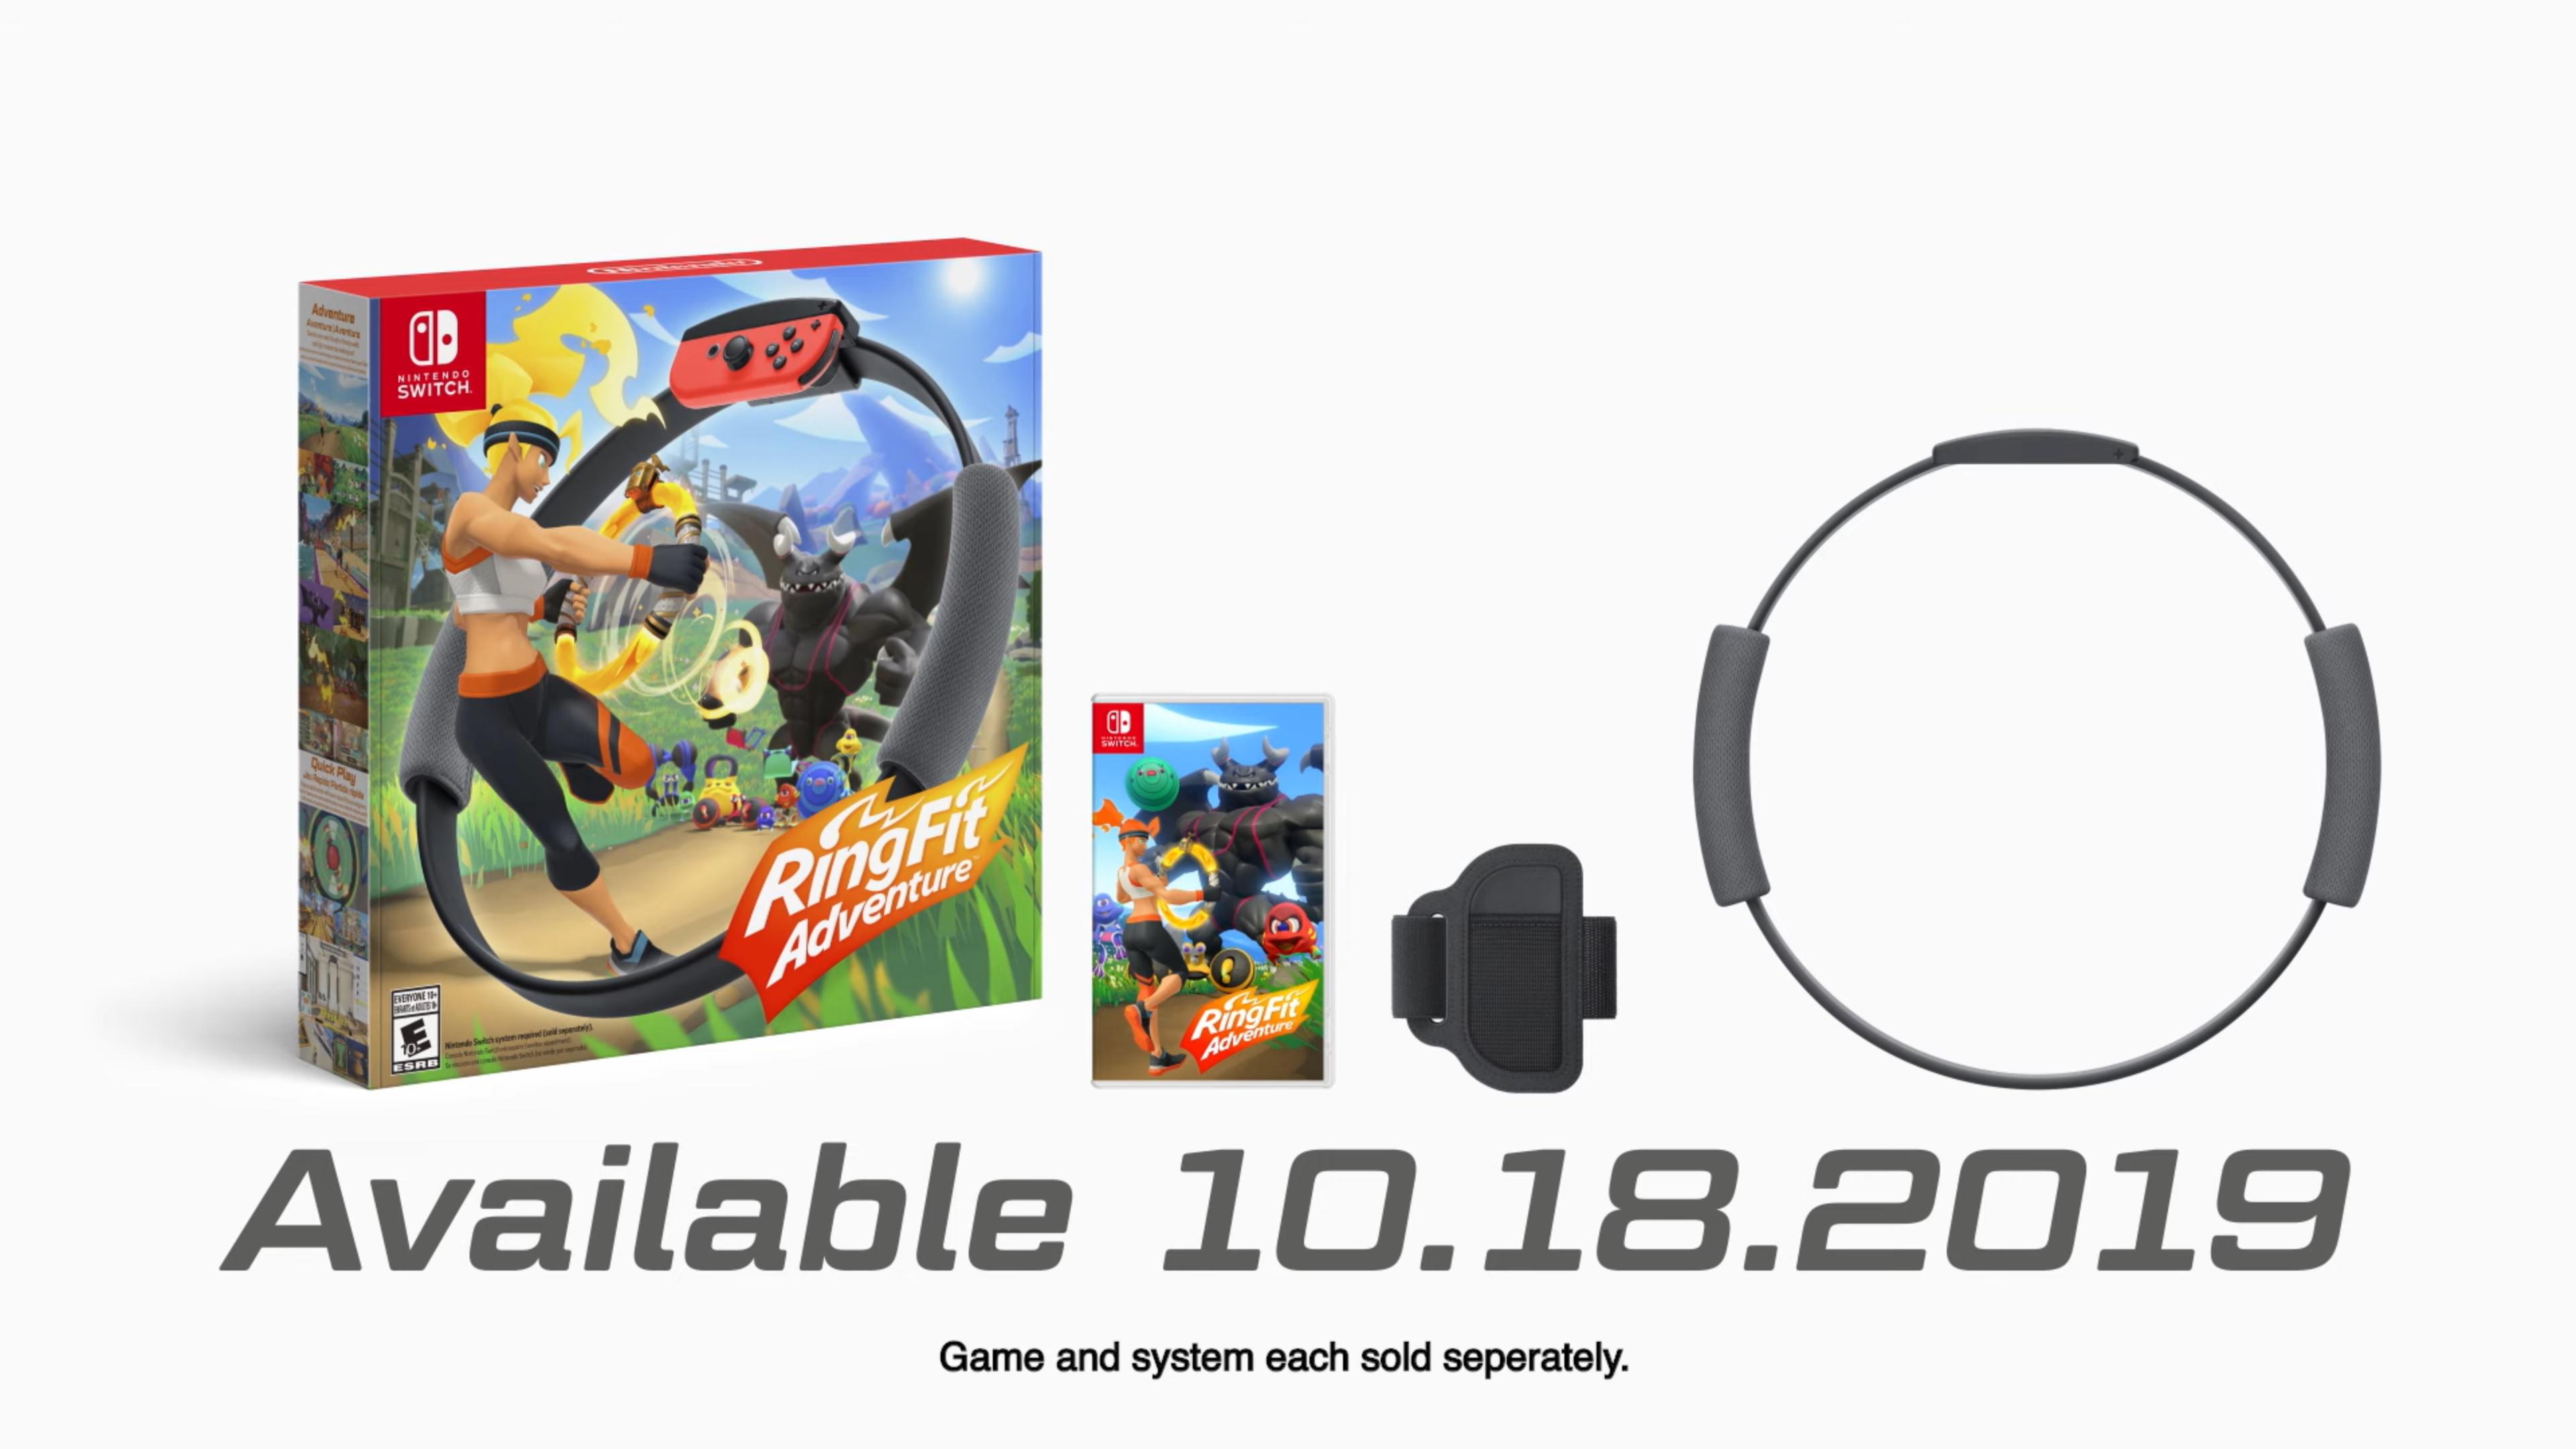 Nintendo reveals Ring Fit Adventure, launches October 18